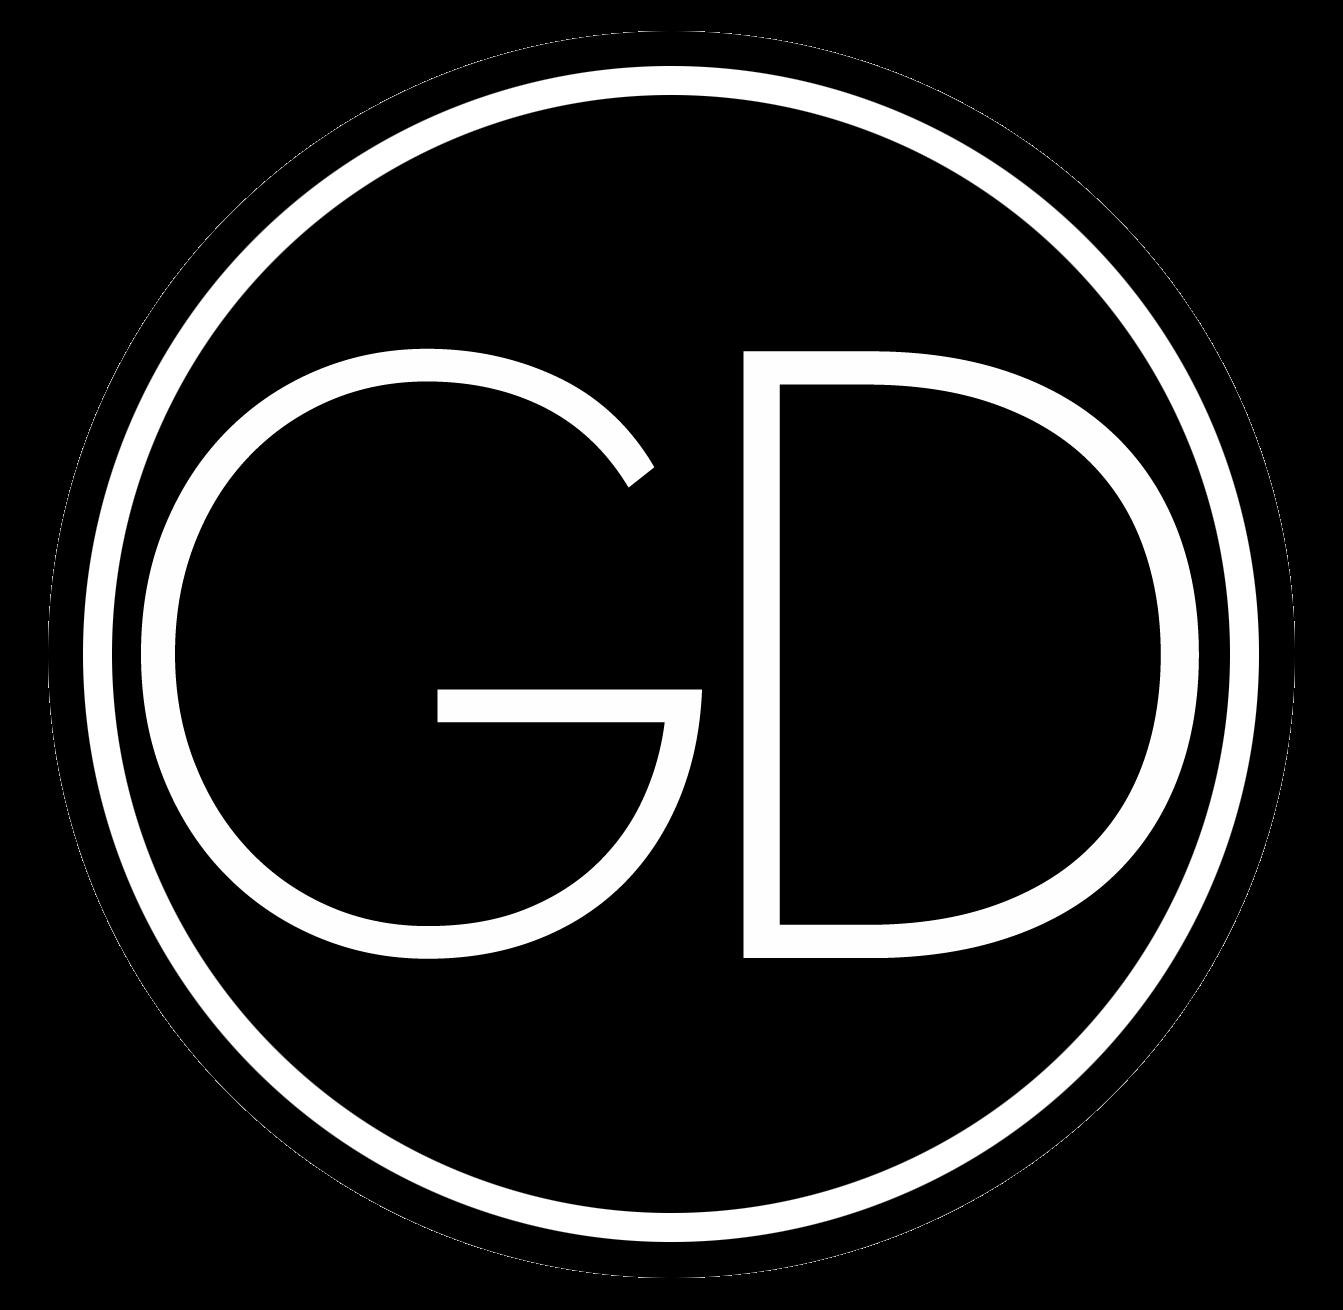 Go to Gabriele Diwald's profile